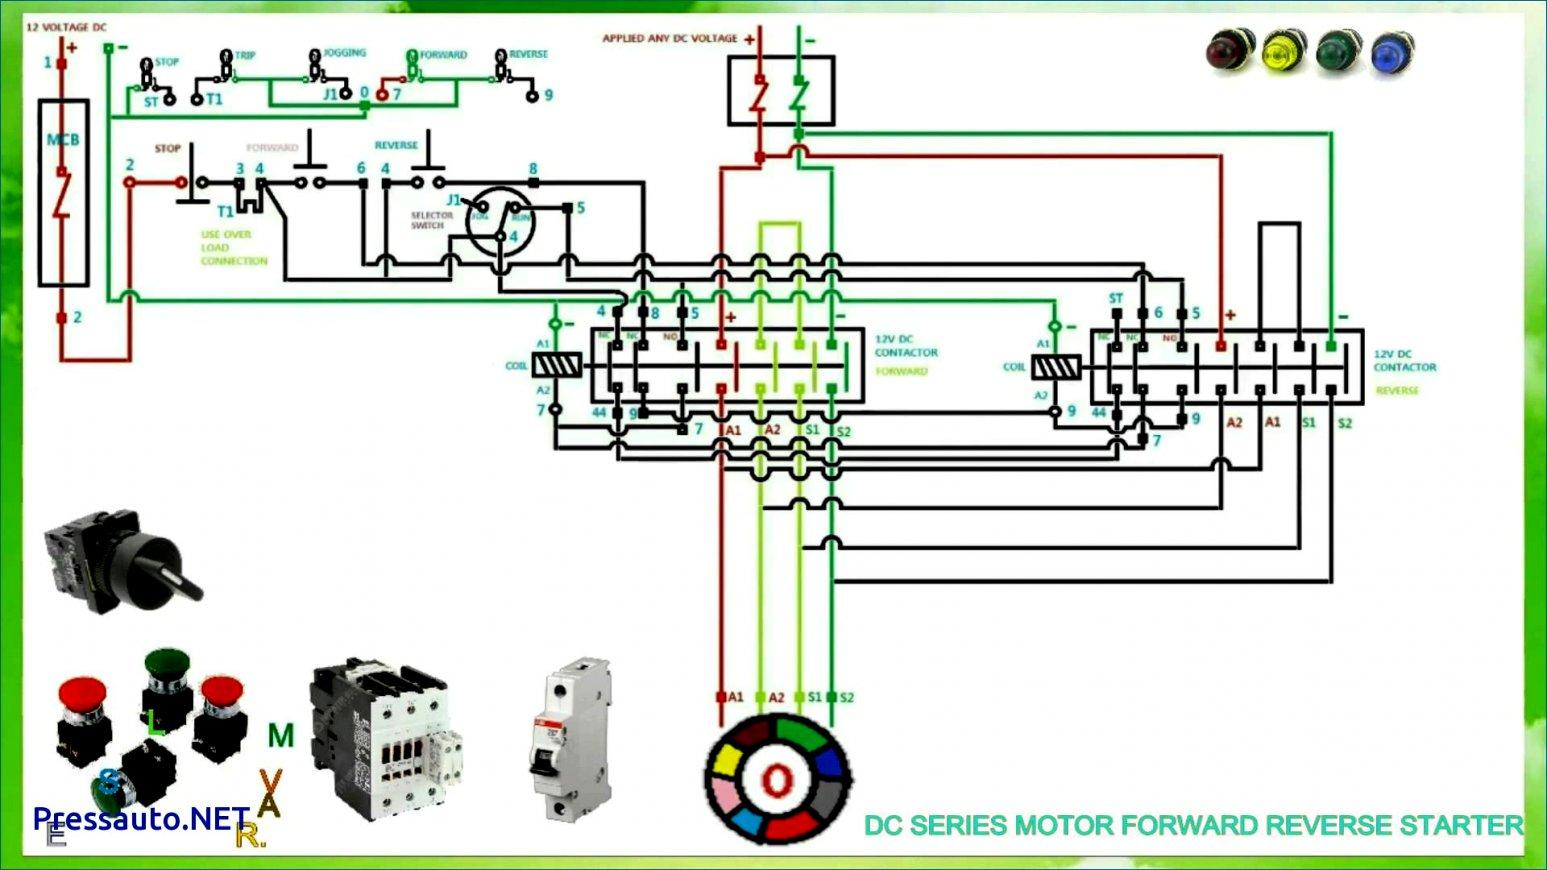 Single Phase Motor Forward Reverse Wiring Diagram | Wiring Diagram - Reversing Single Phase Motor Wiring Diagram